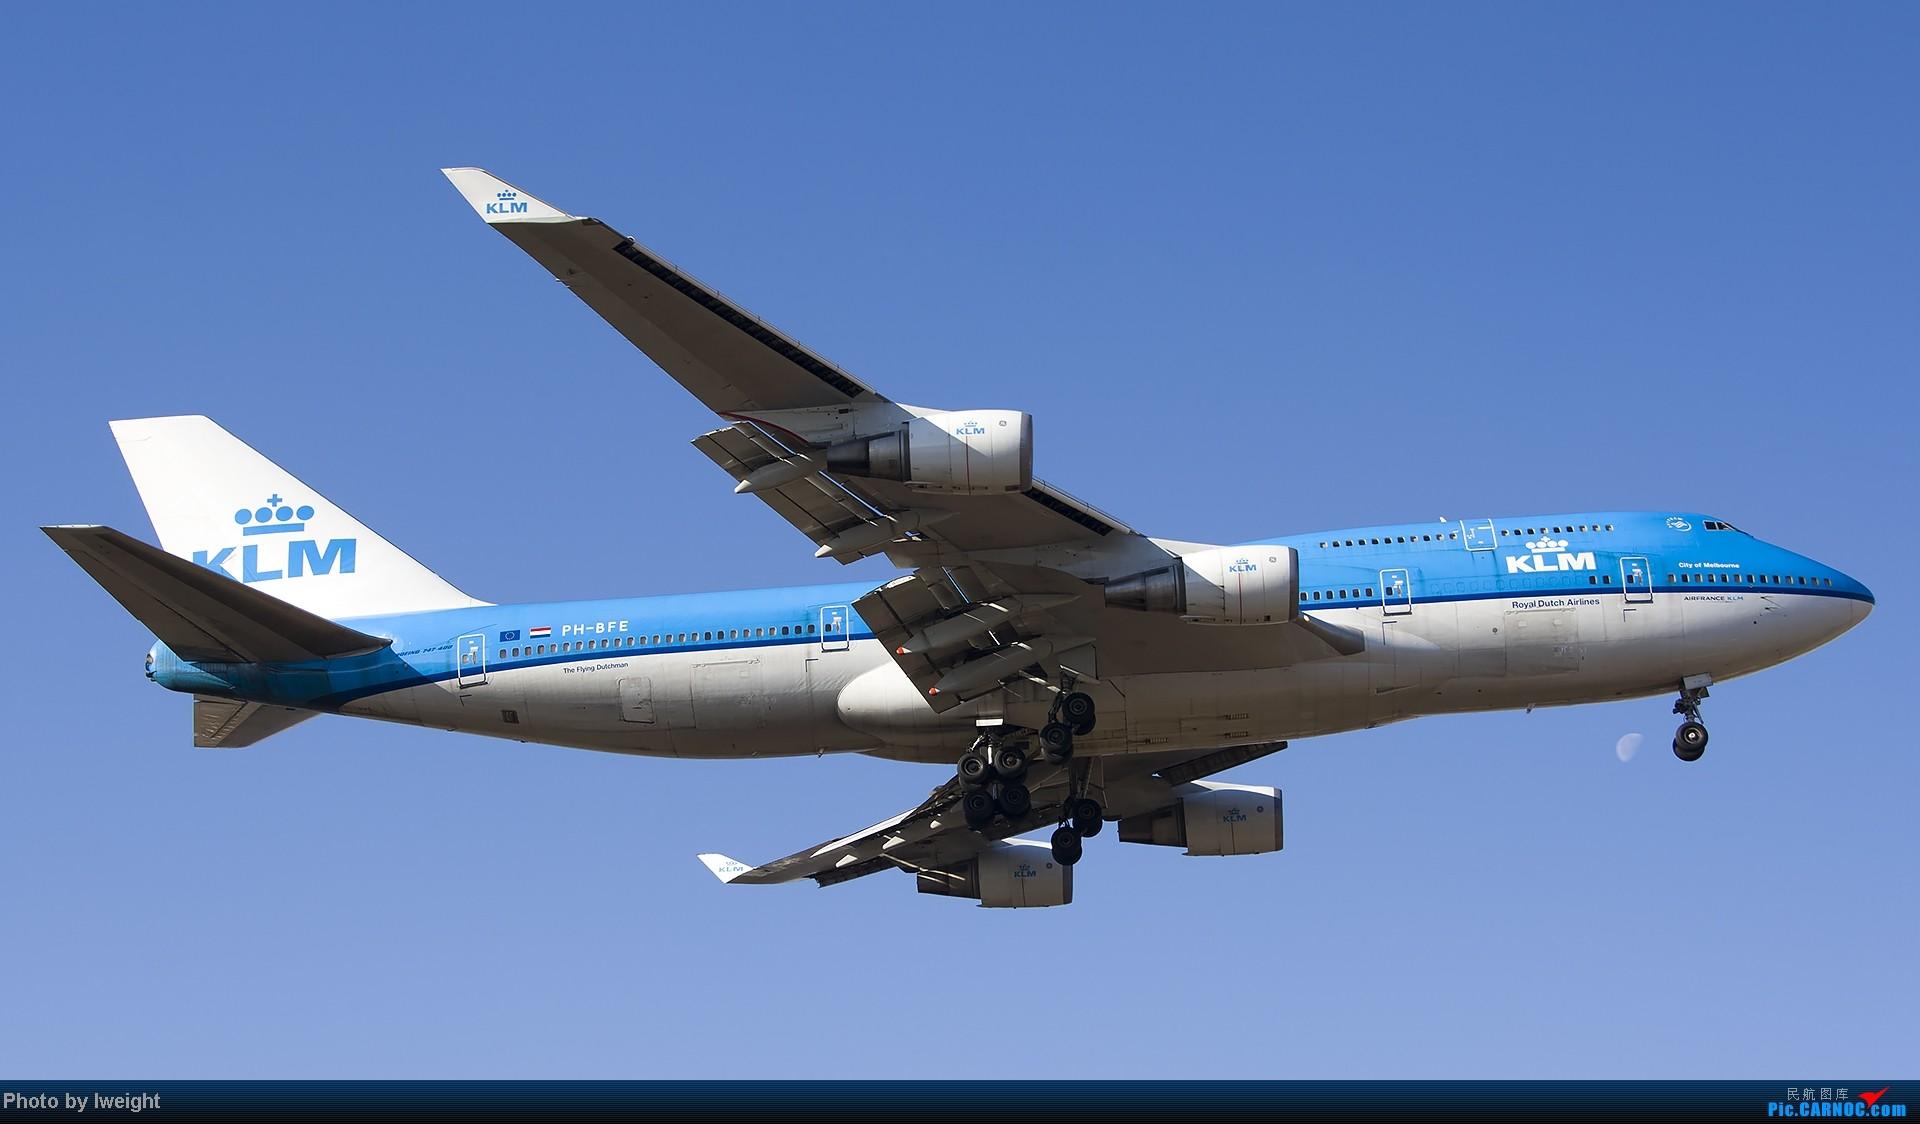 Re:[原创]抓住APEC蓝的尾巴,再拍上一组 BOEING 747-400 PH-BFE 中国北京首都机场